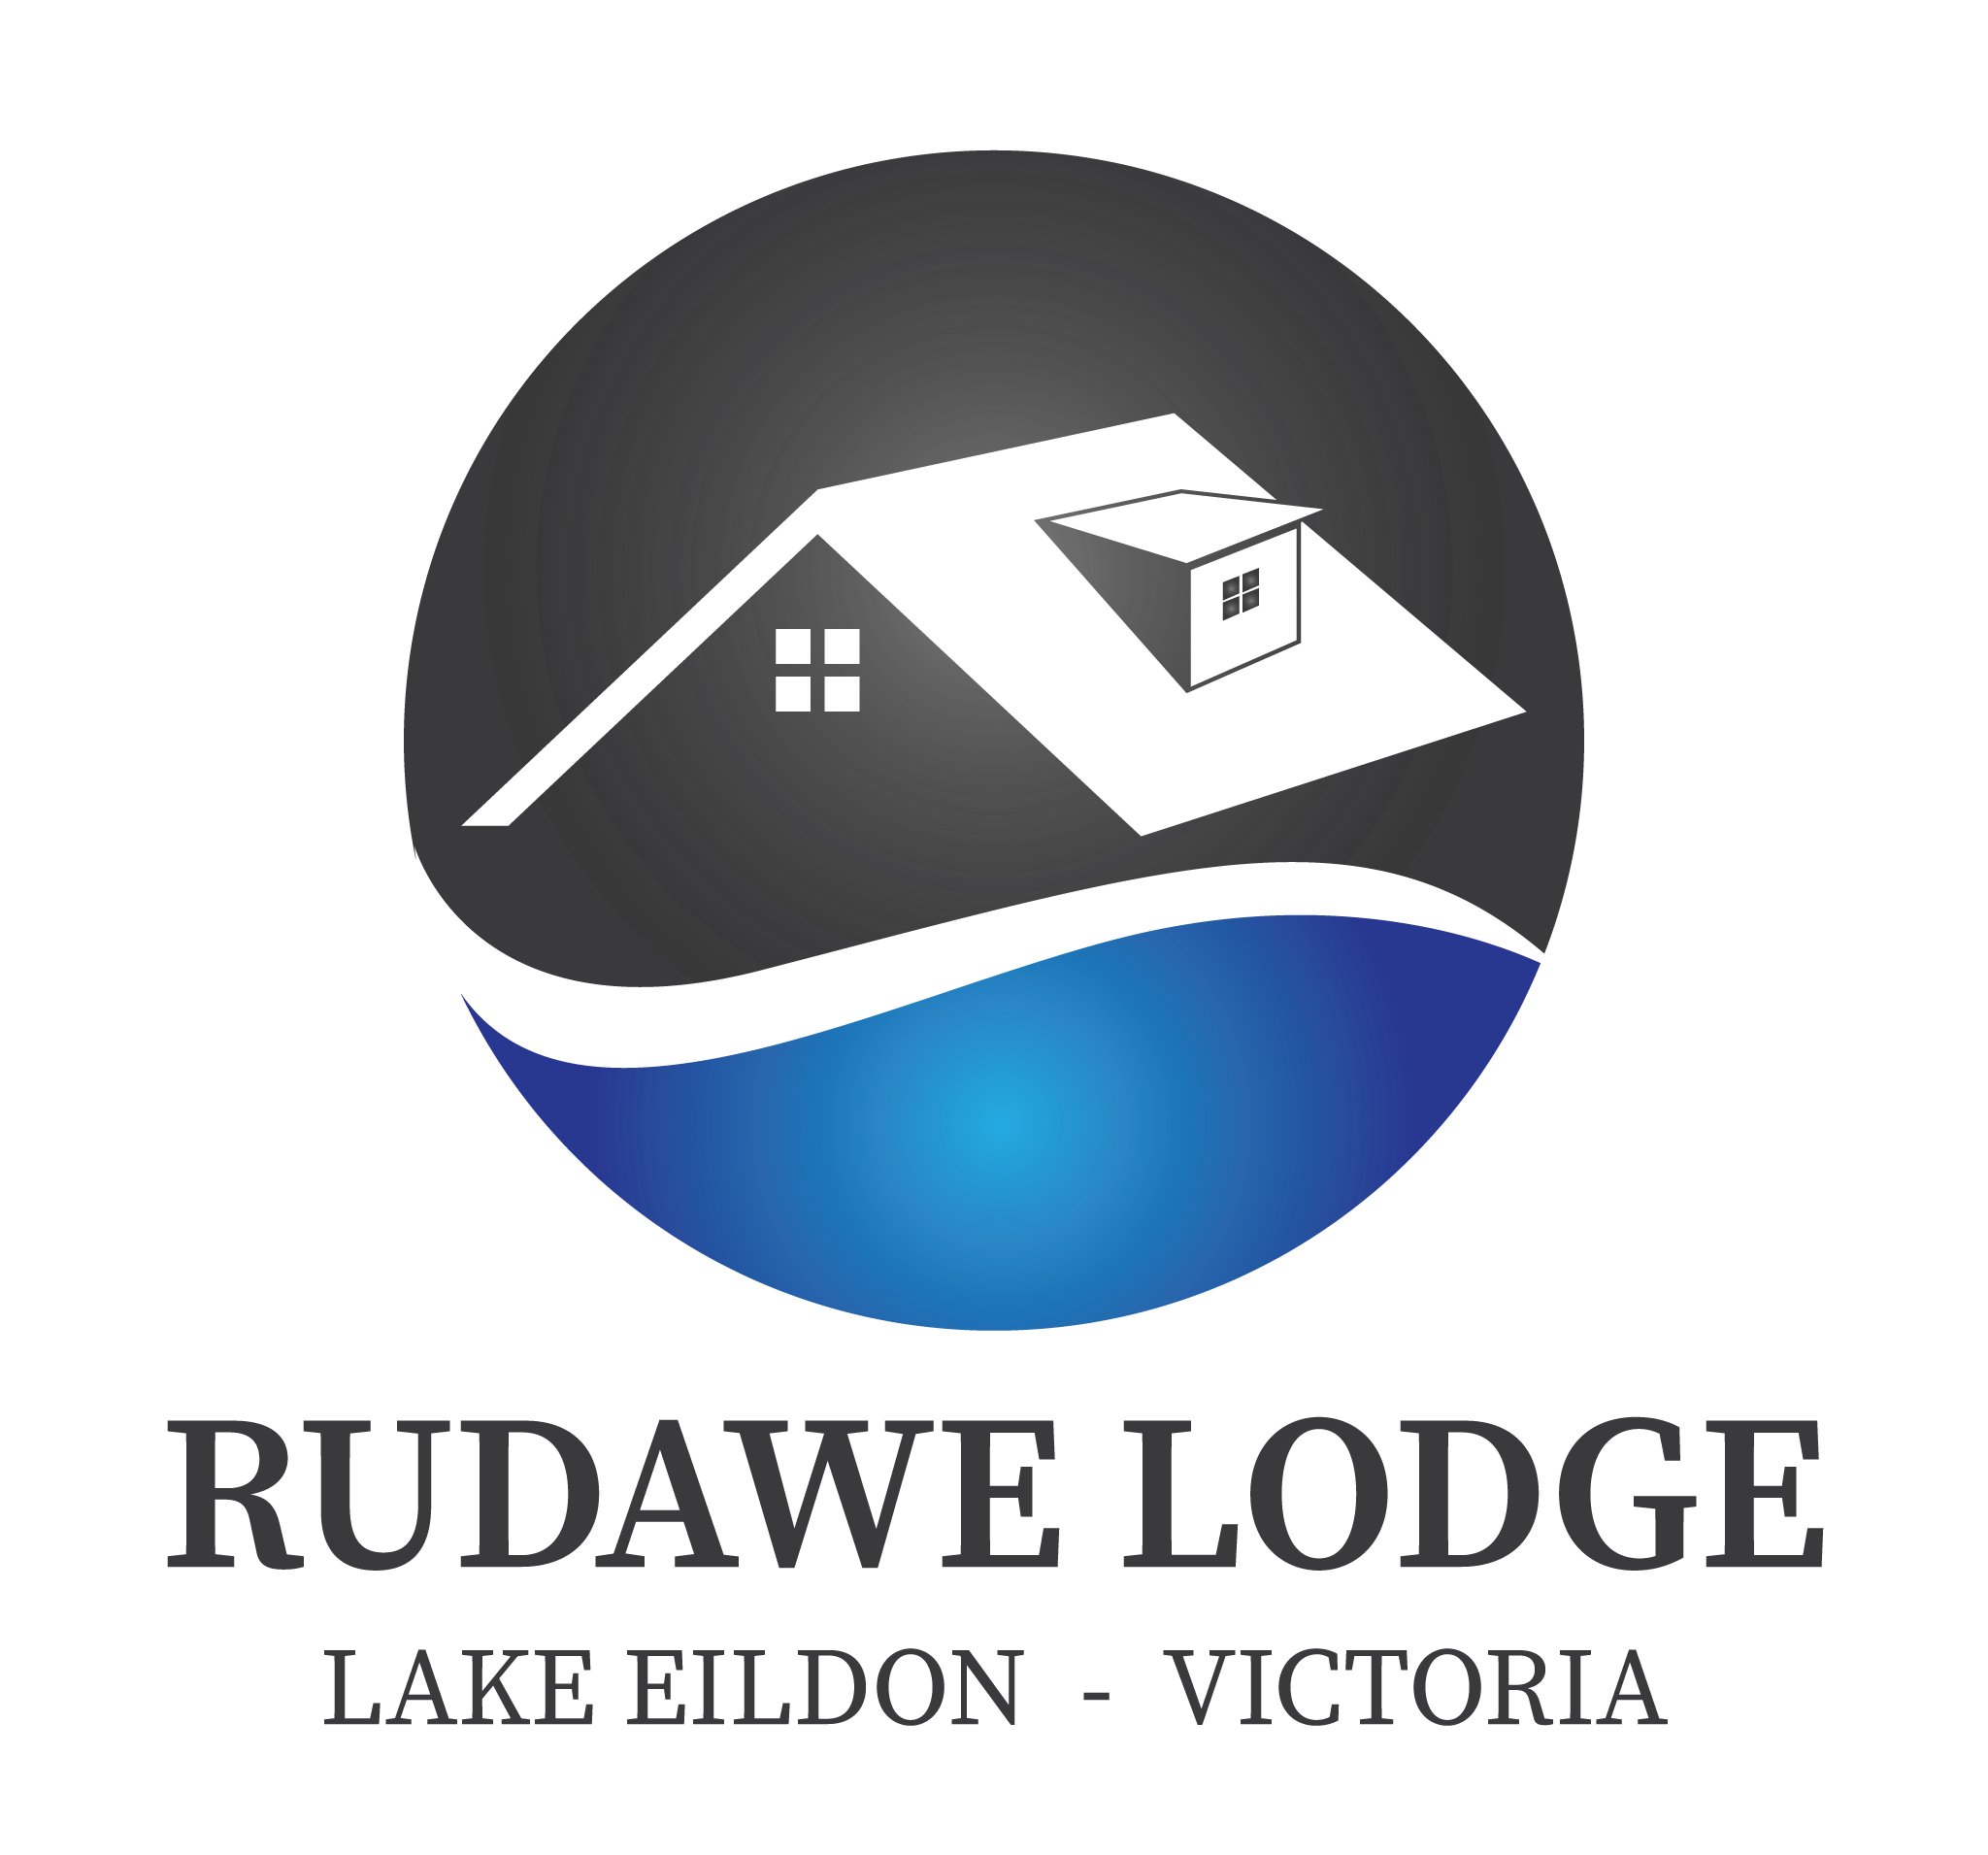 Rudawe Lodge